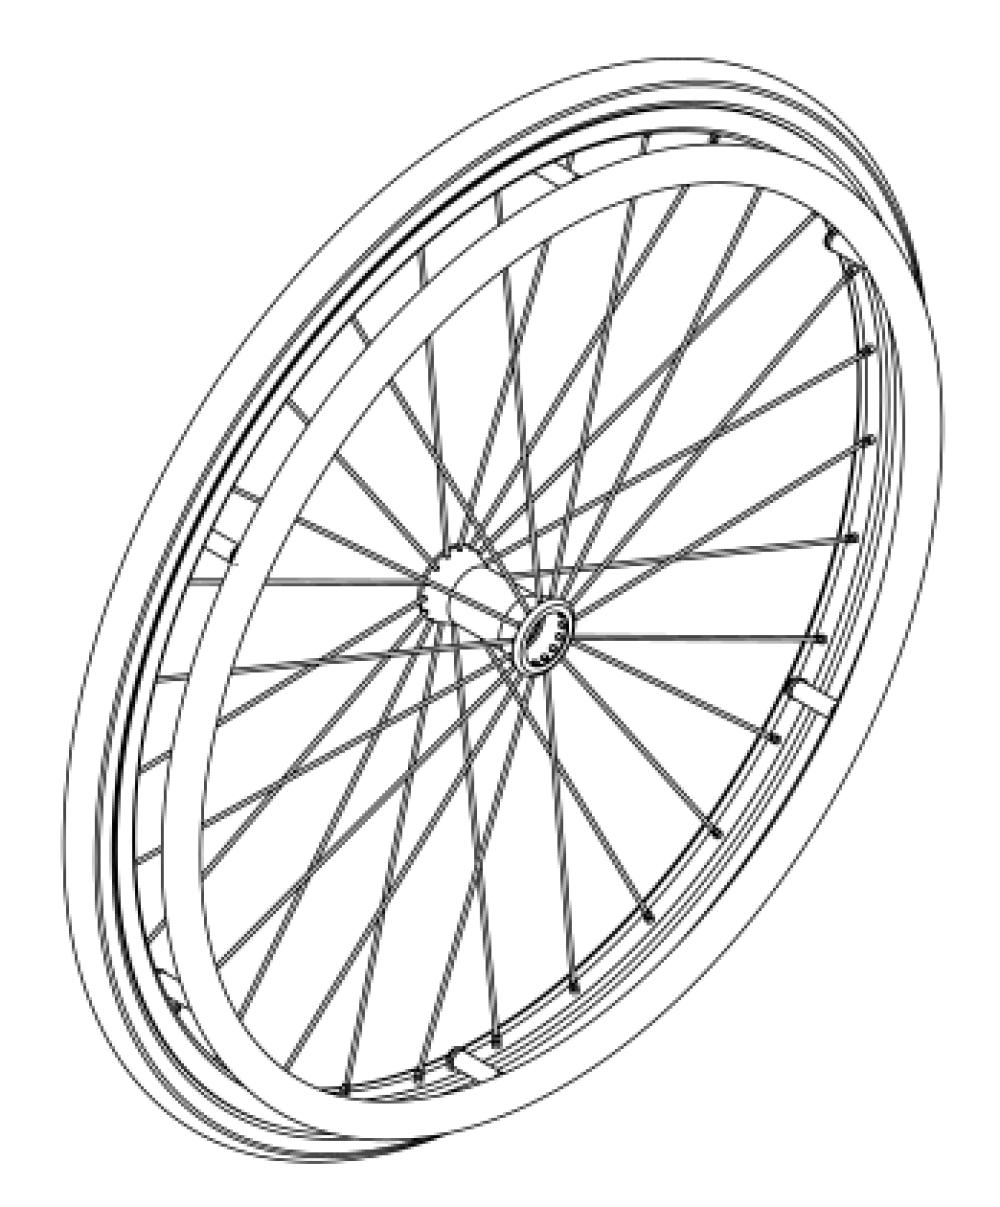 (discontinued) Little Wave Spoke Wheel / Tire / Handrim Kits parts diagram